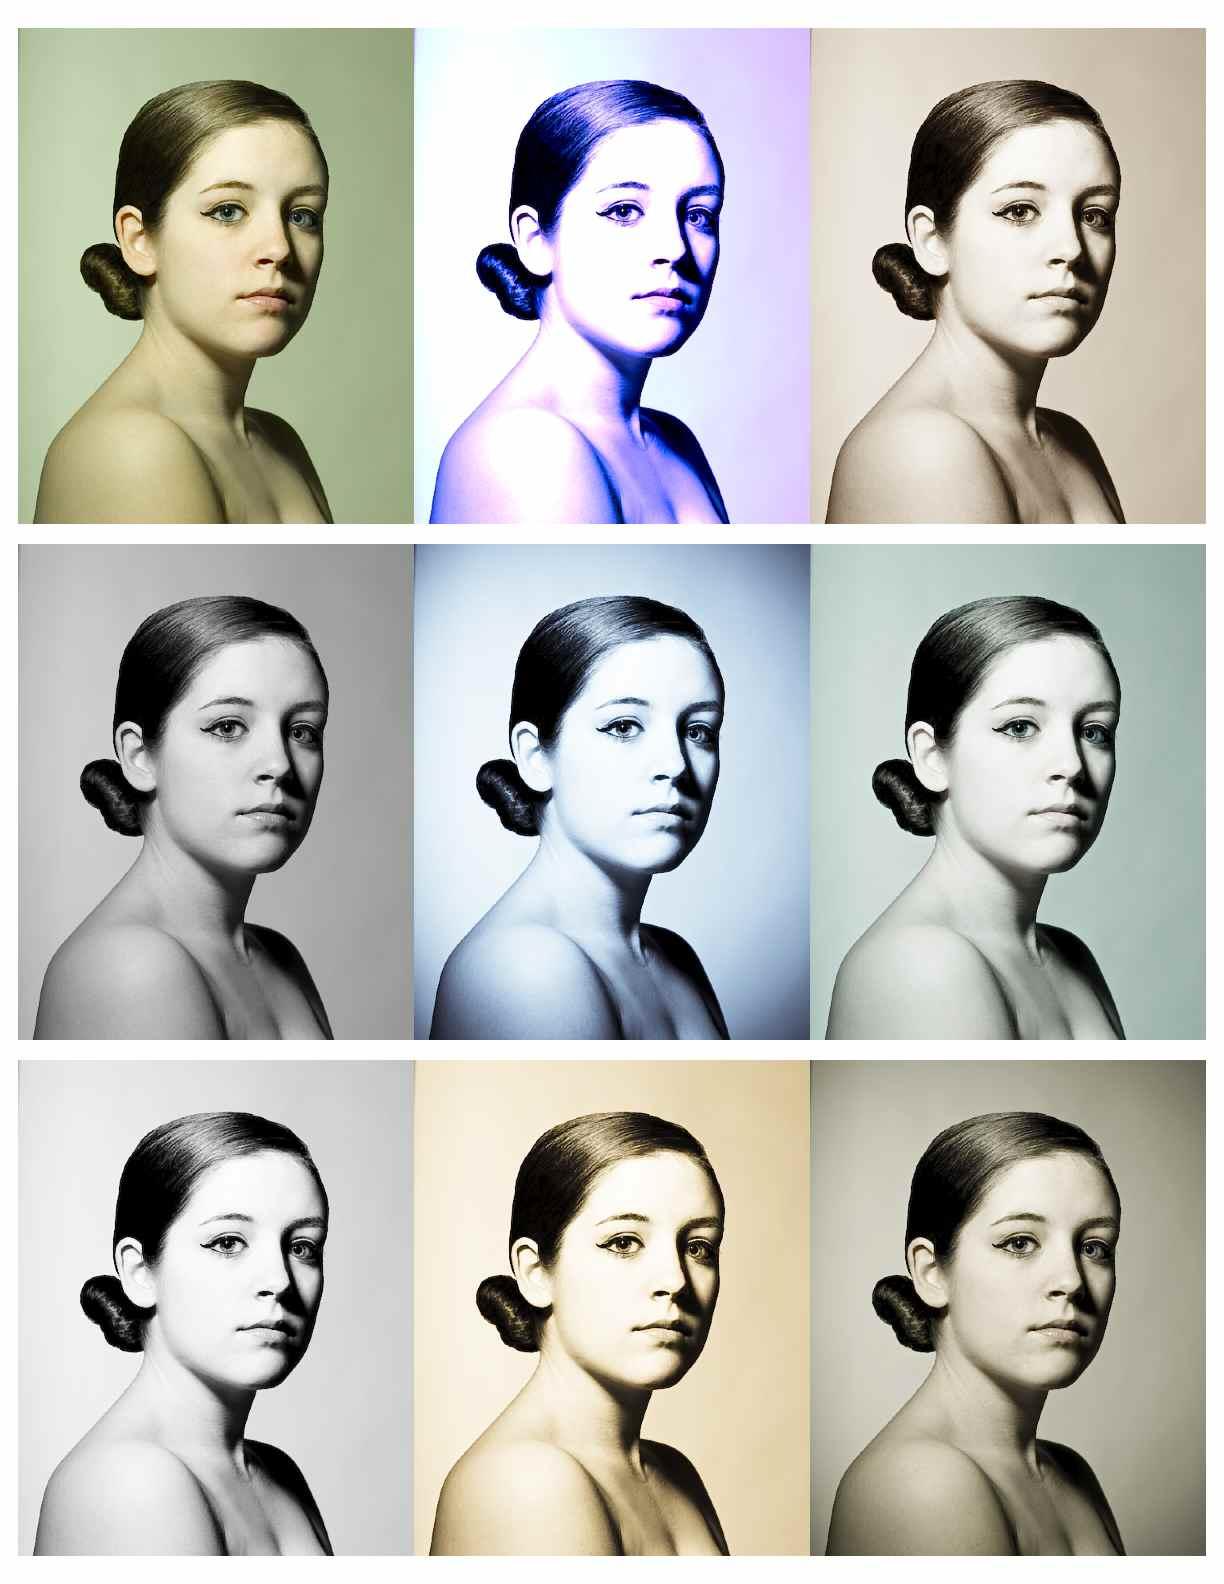 self portrait 751167 teen titans hentia comic, free christisn teen chat rooms, bald teen shemale, ...